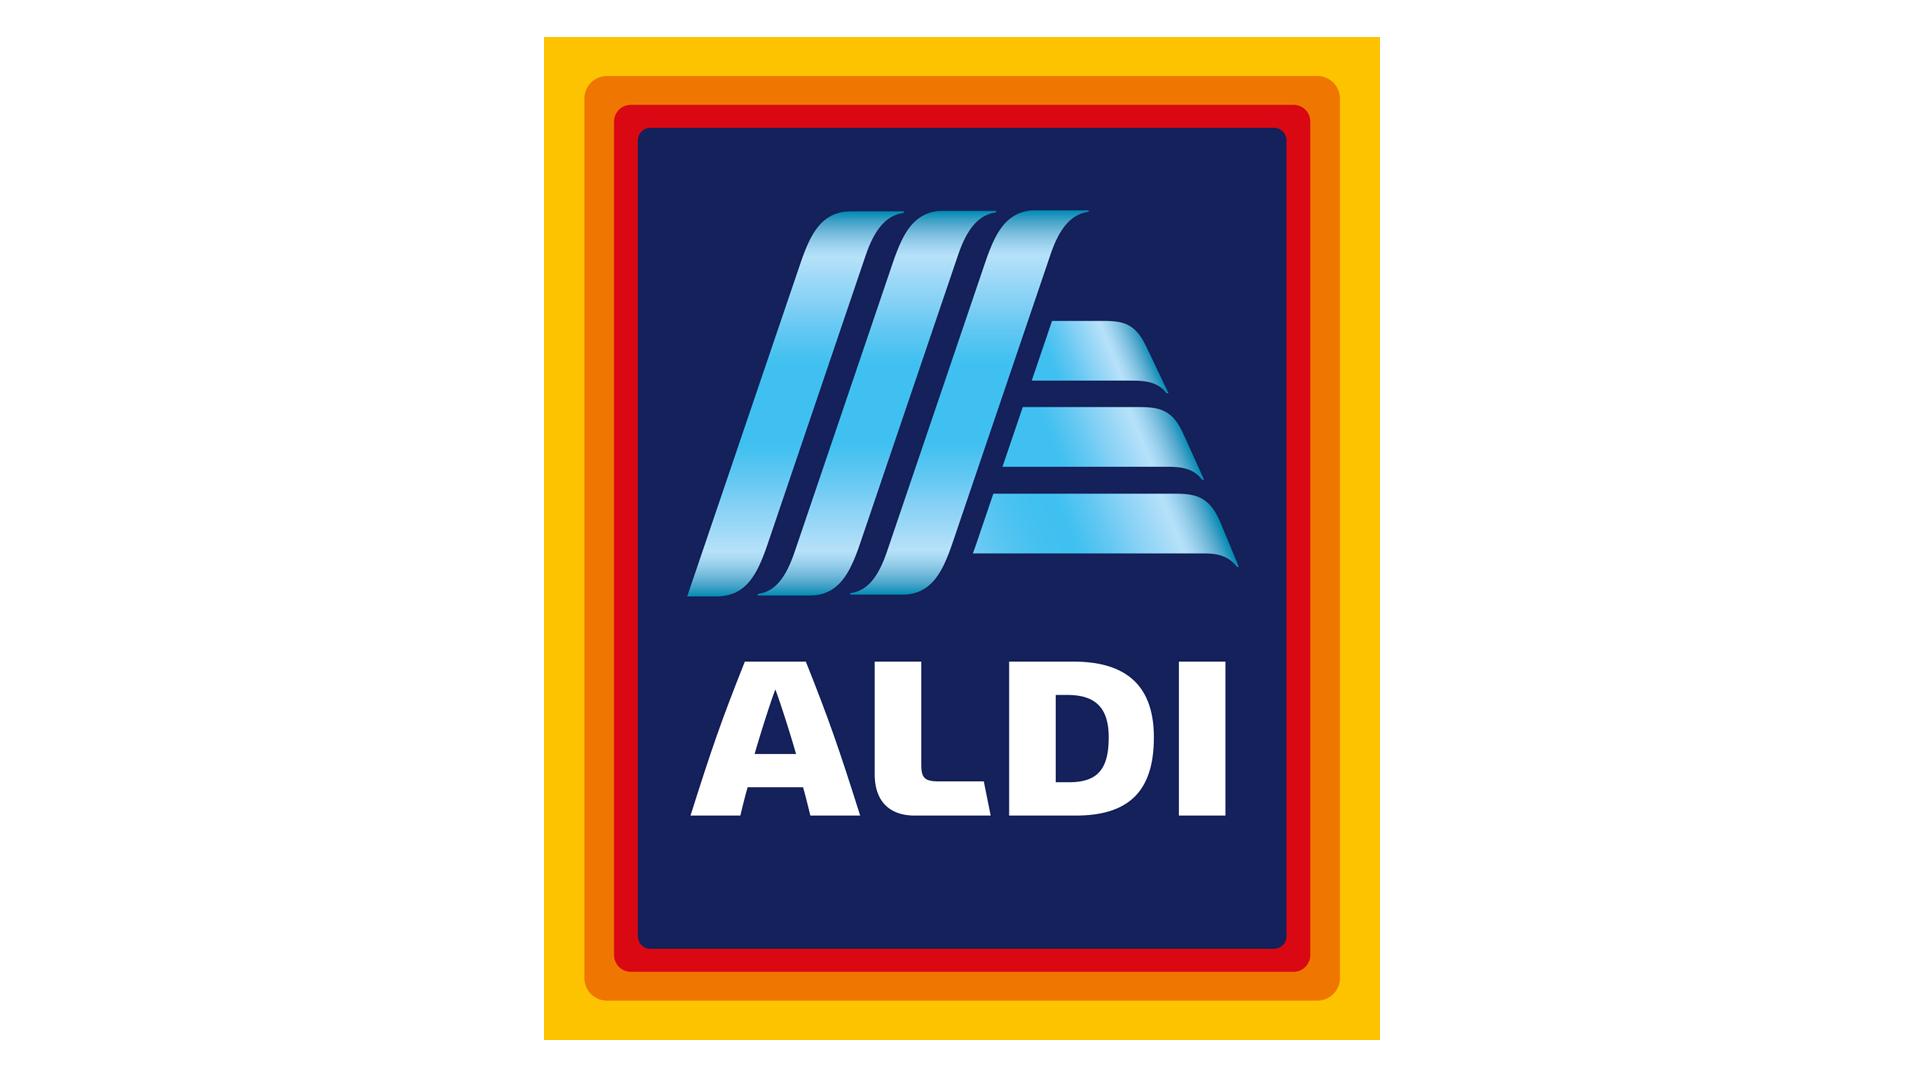 Aldi Car Insurance